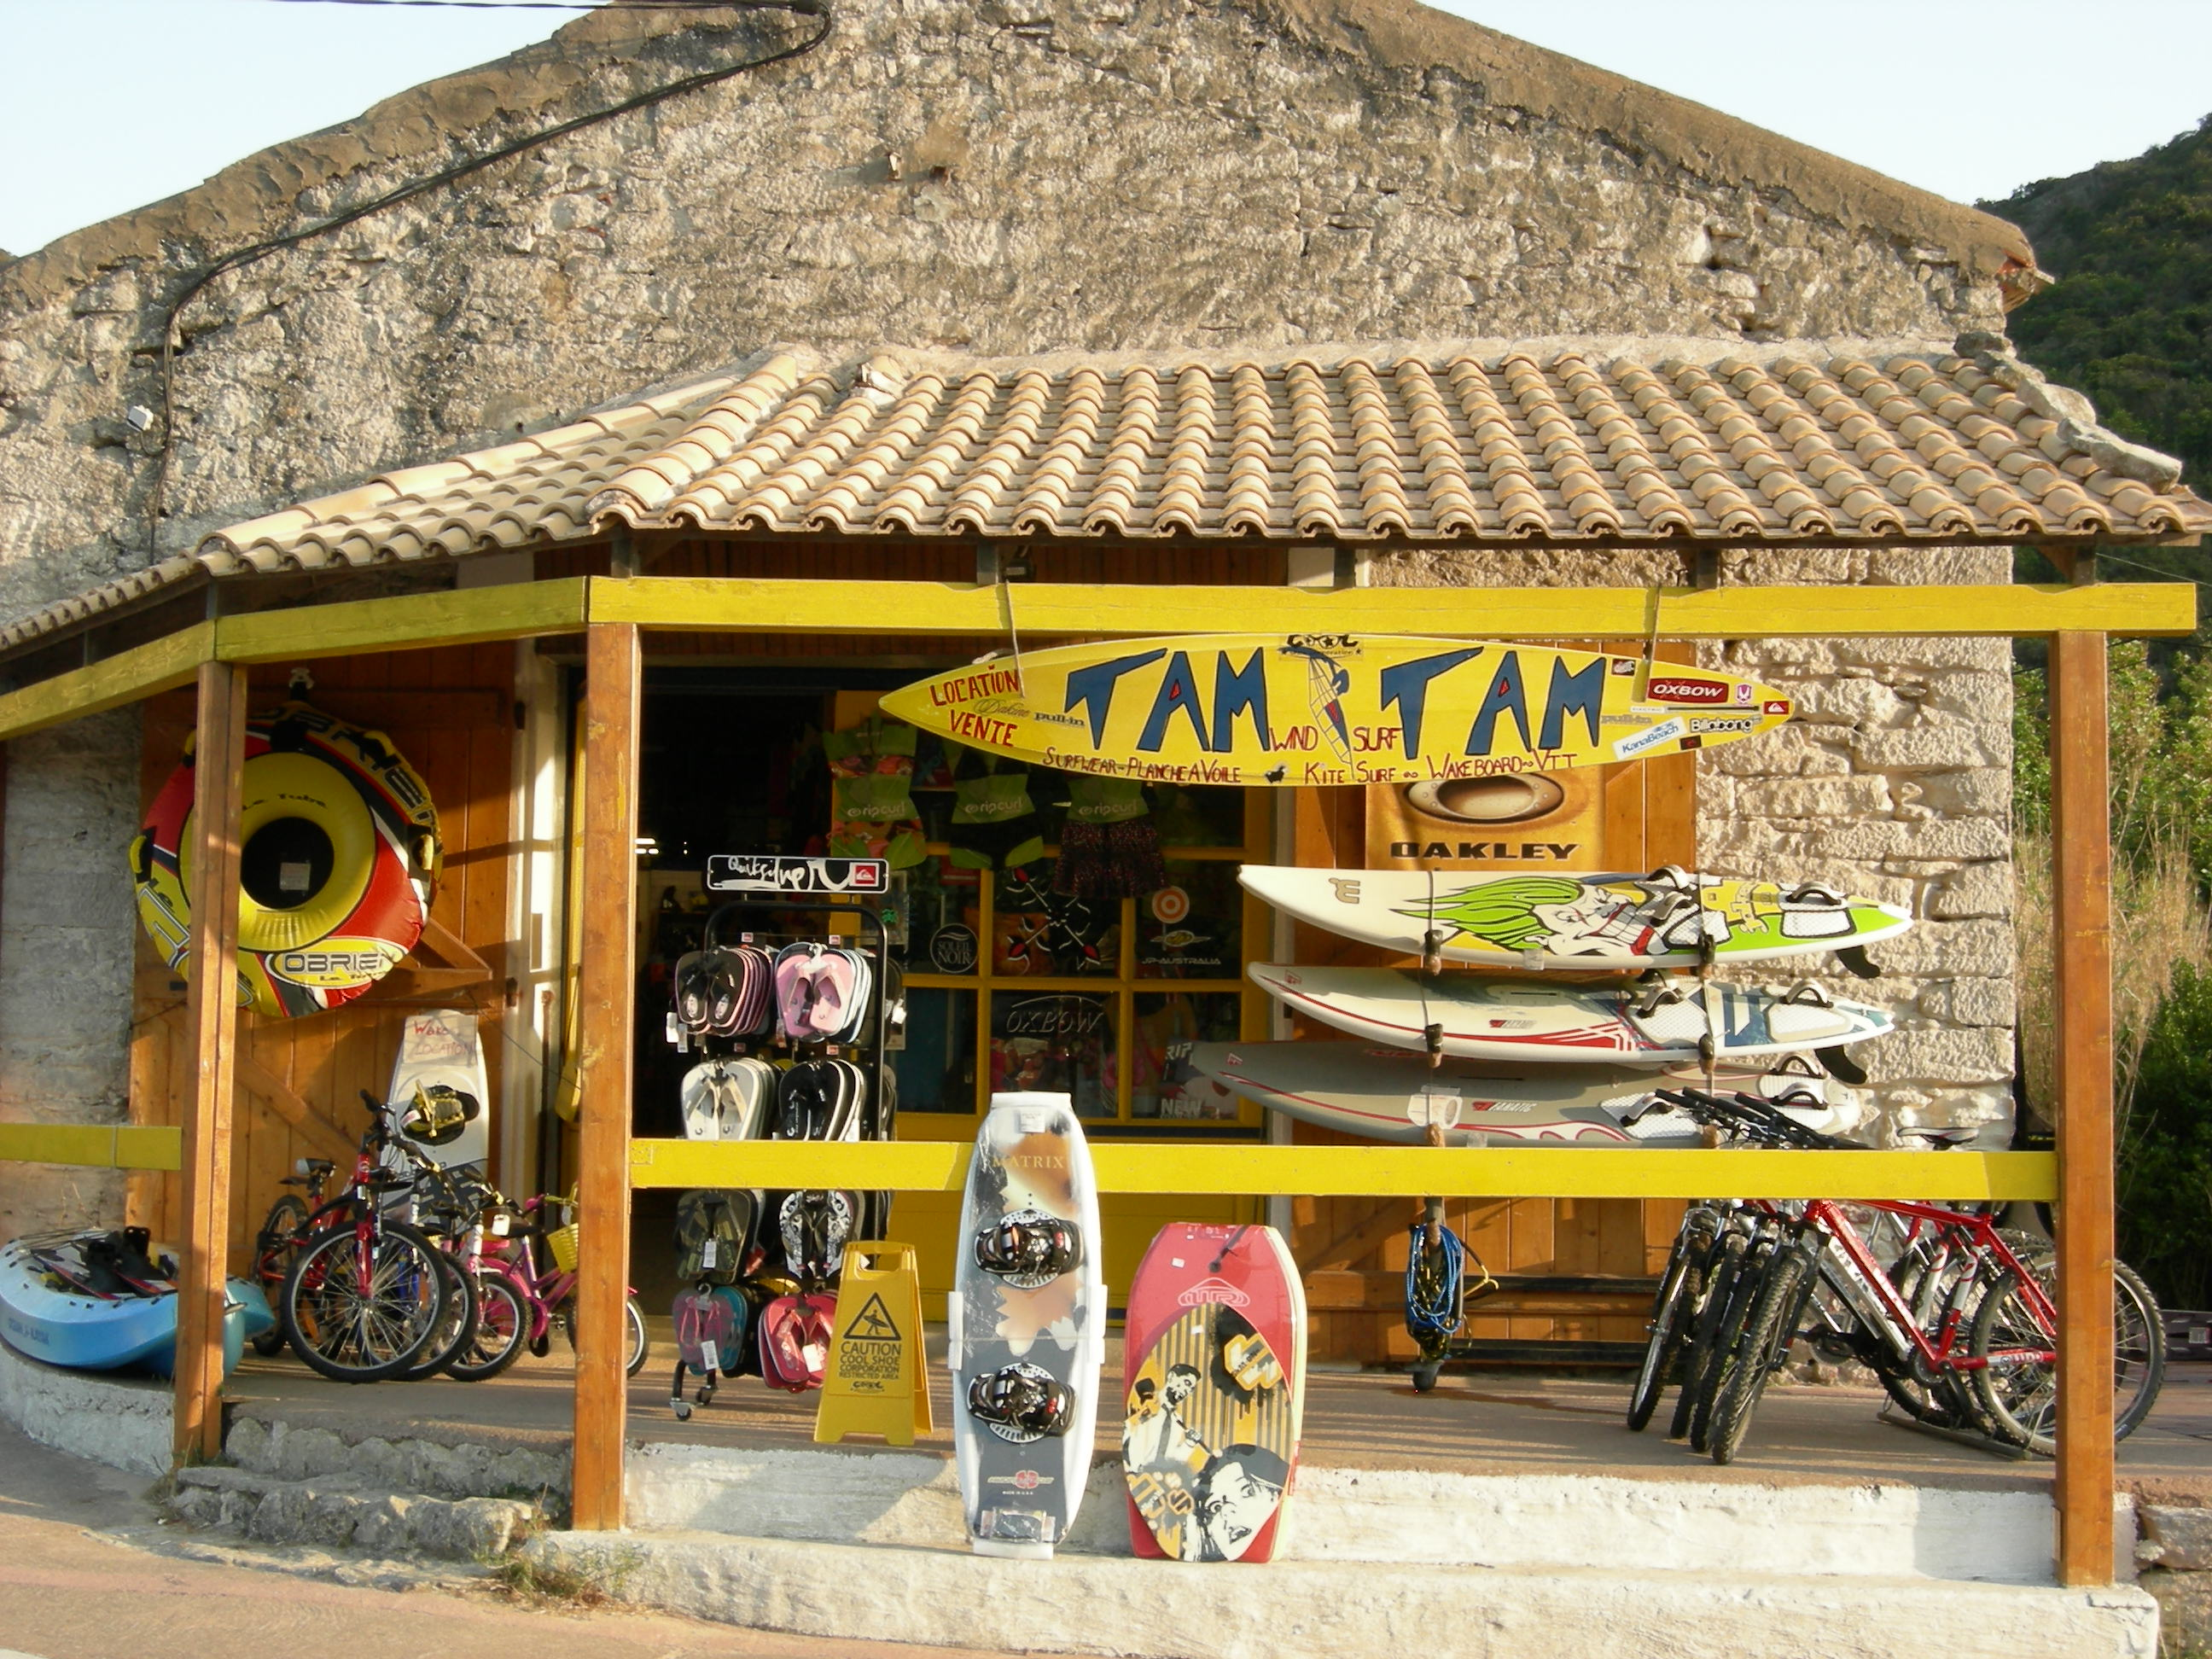 Location-tamtam-boutique-bonifacio-corse.jpg